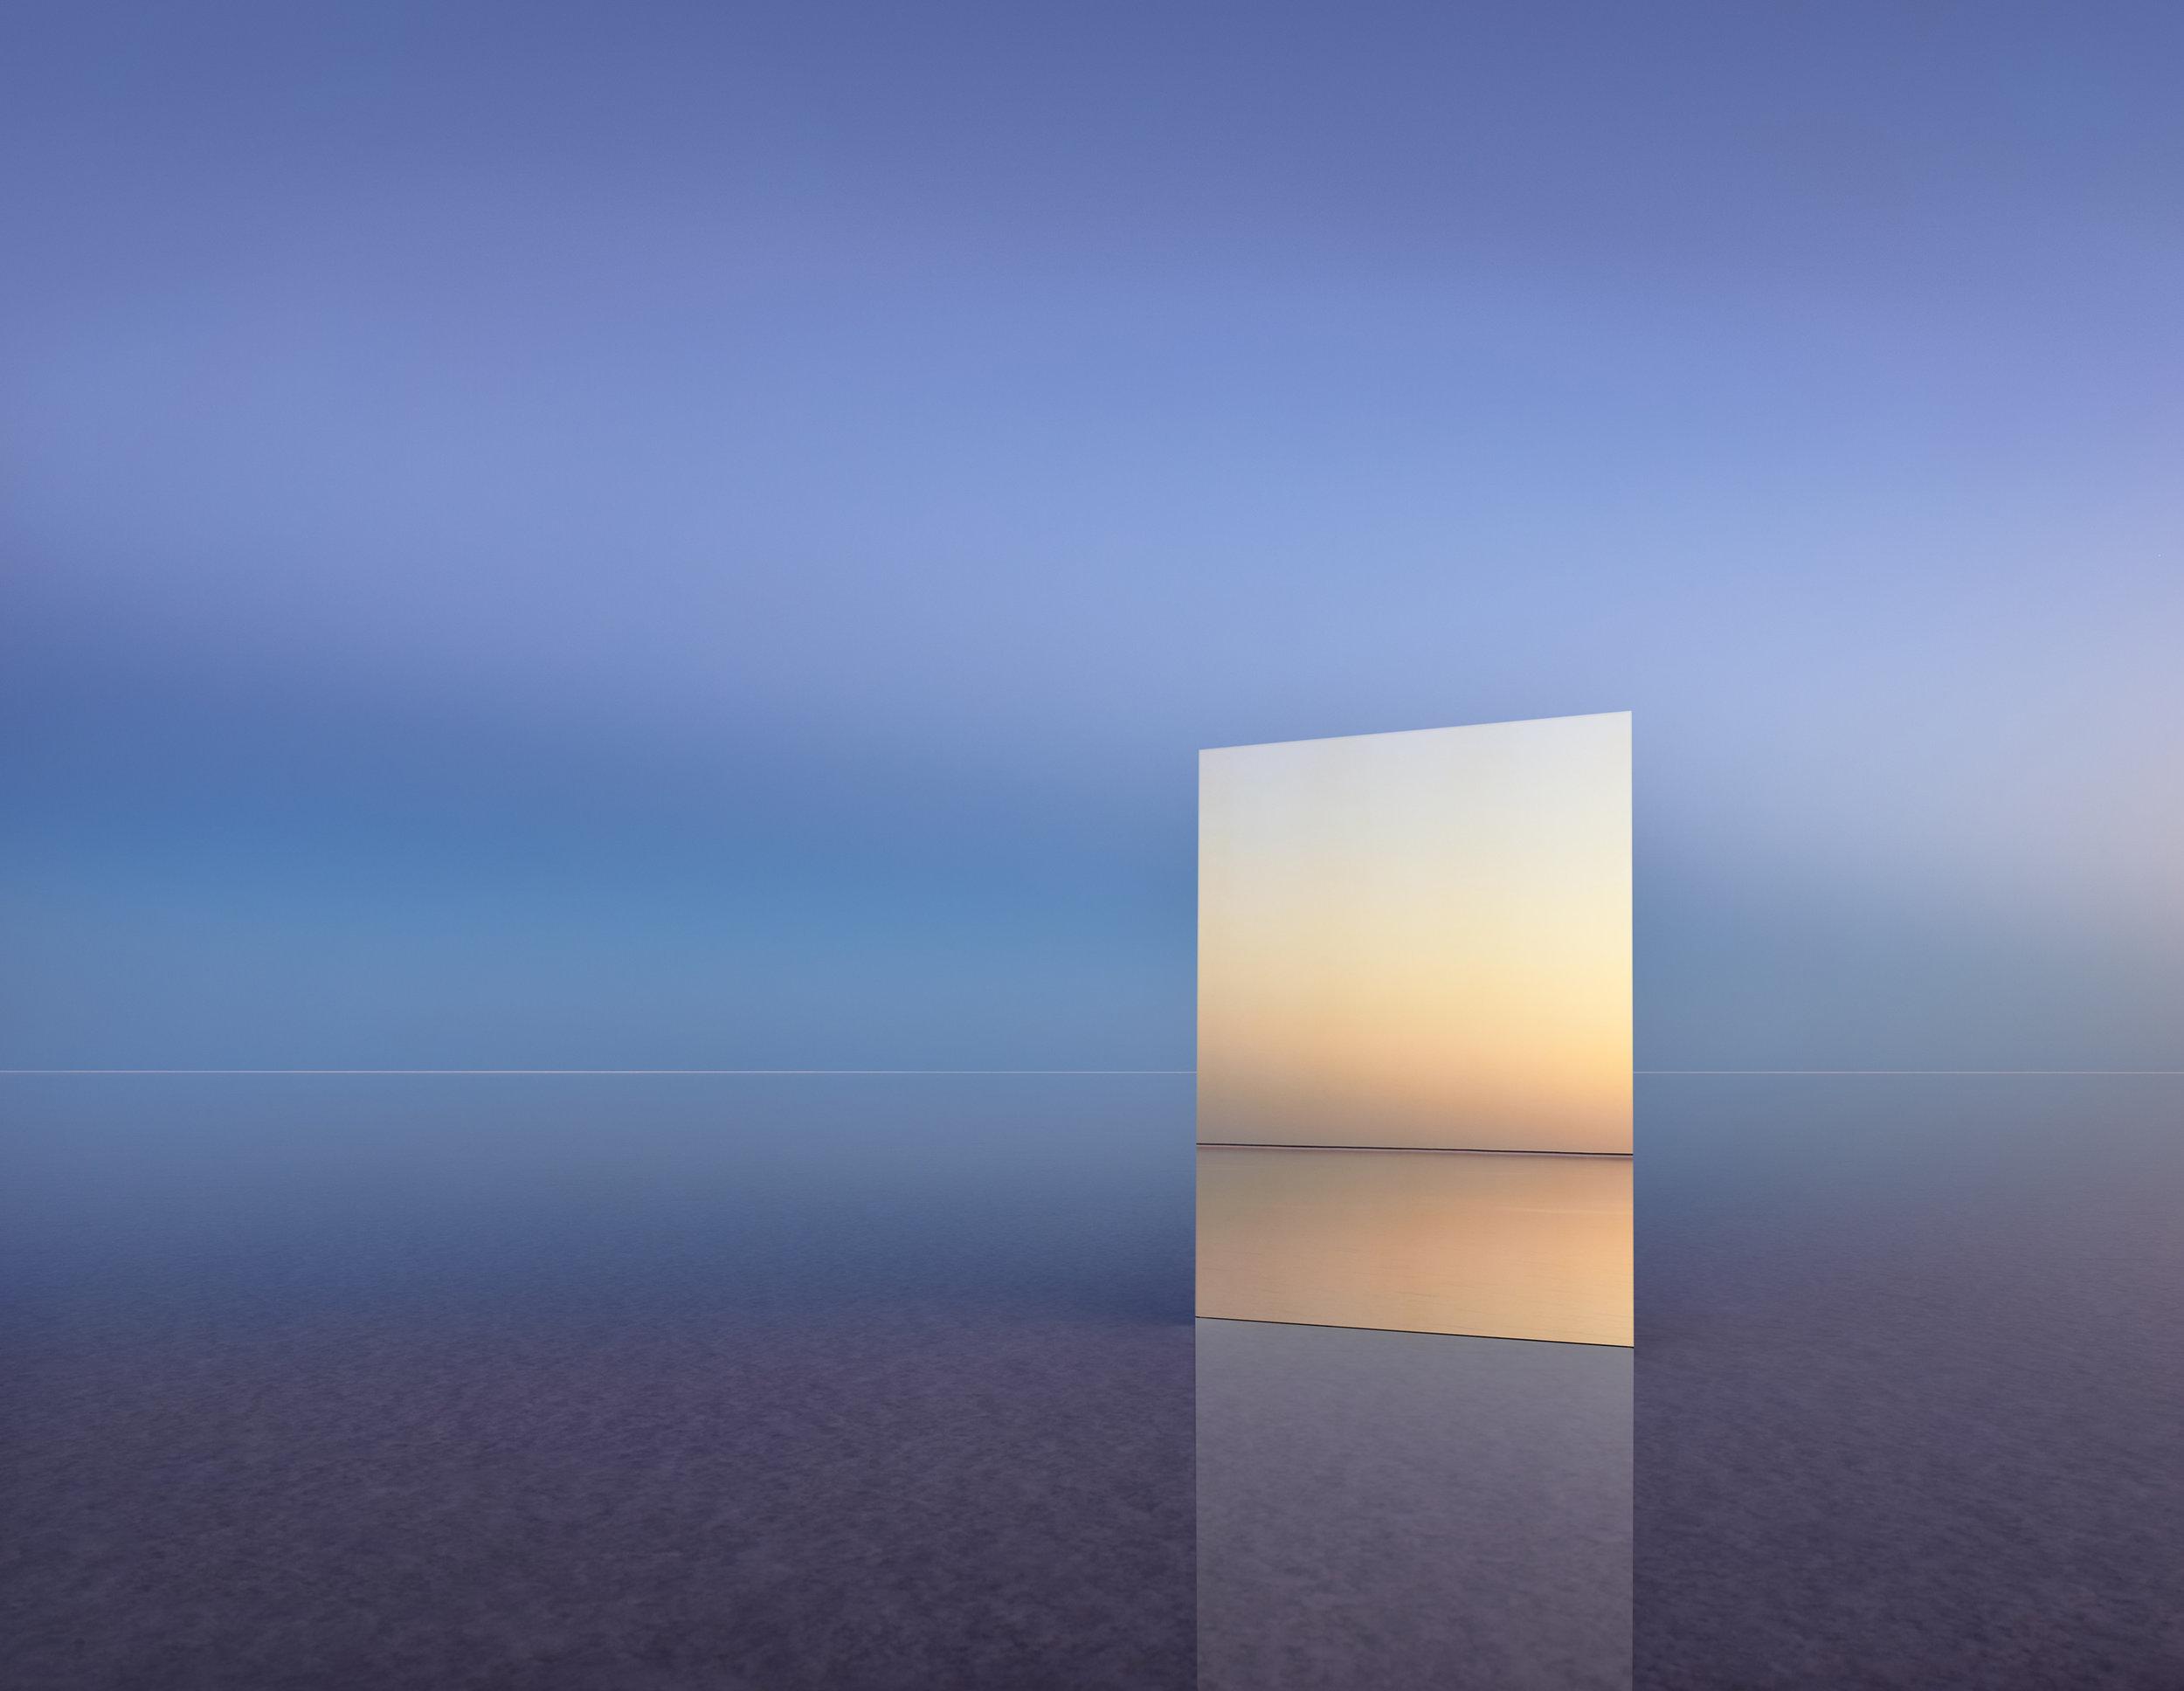 MURRAY FREDERICKS   Mirror 19  2017 Digital pigment print 120 x 155 cm